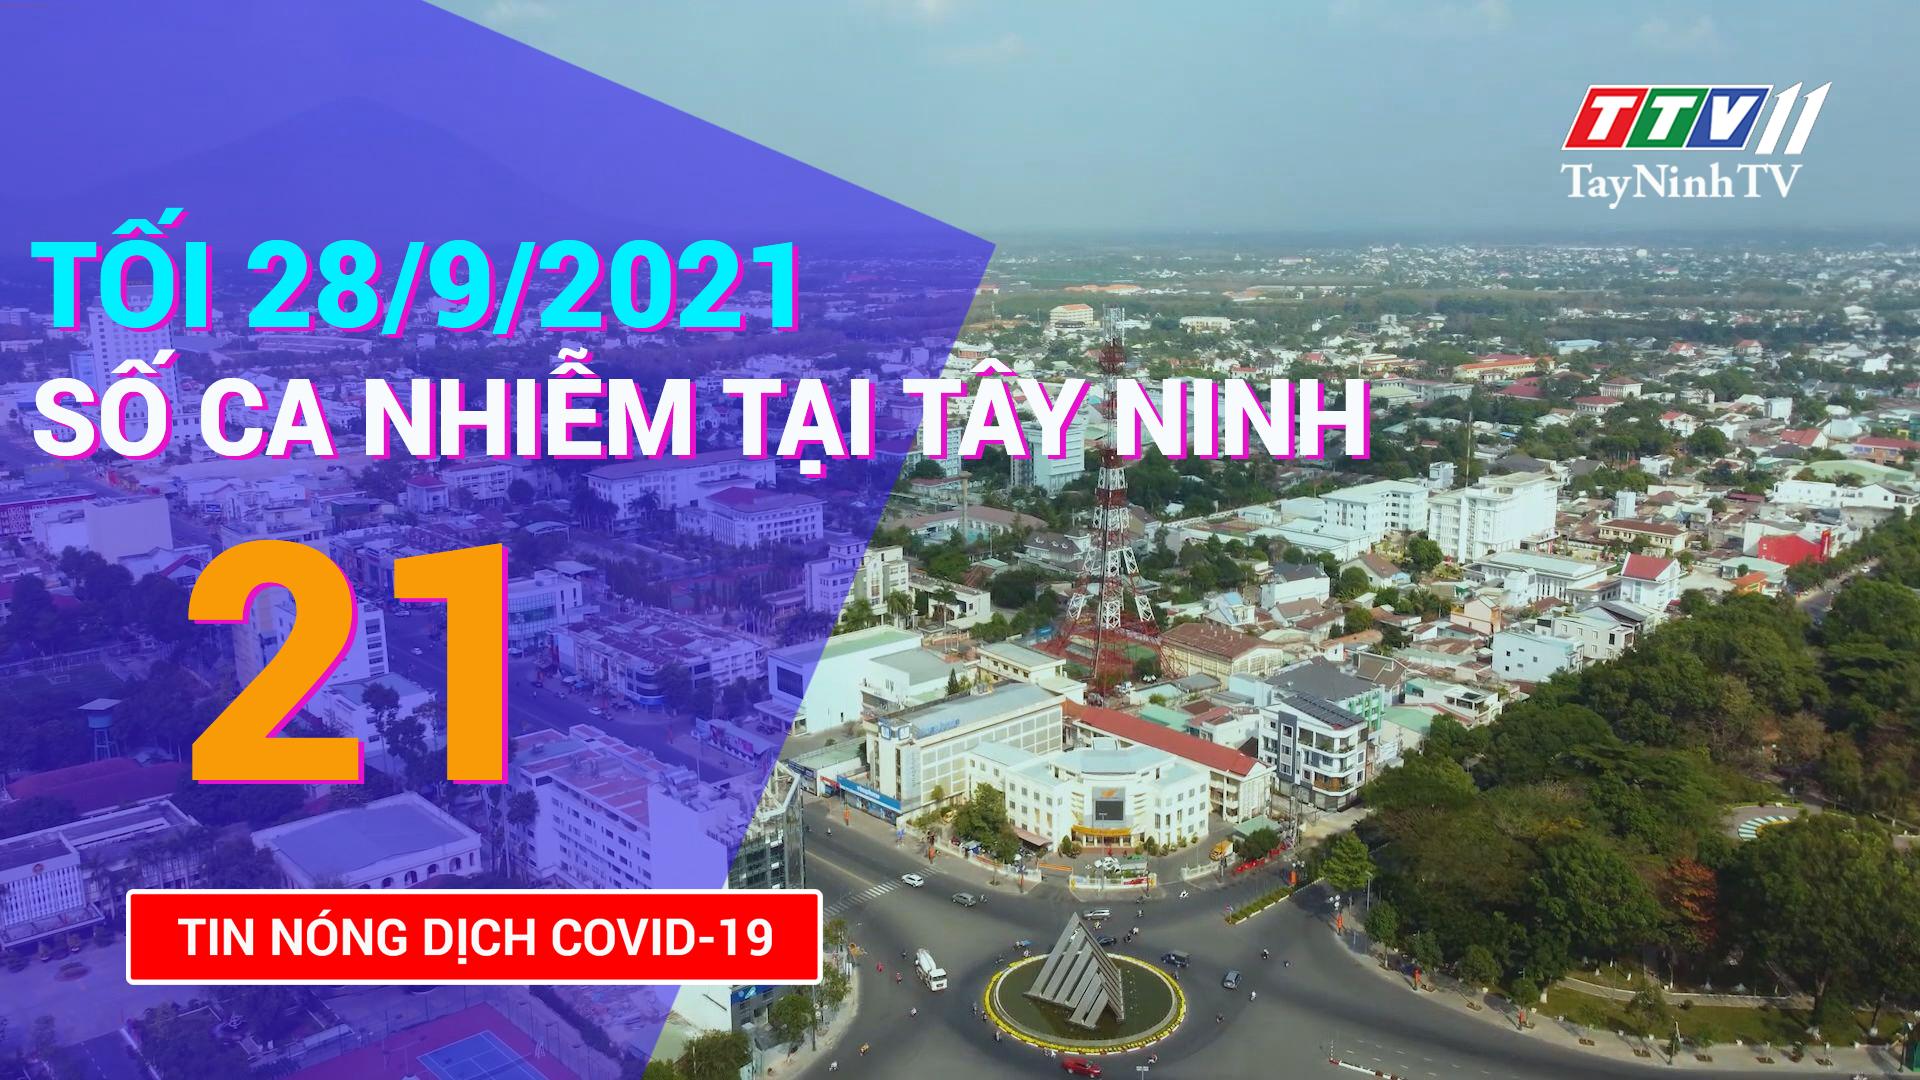 Tin tức Covid-19 tối 28/9/2021 | TayNinhTV